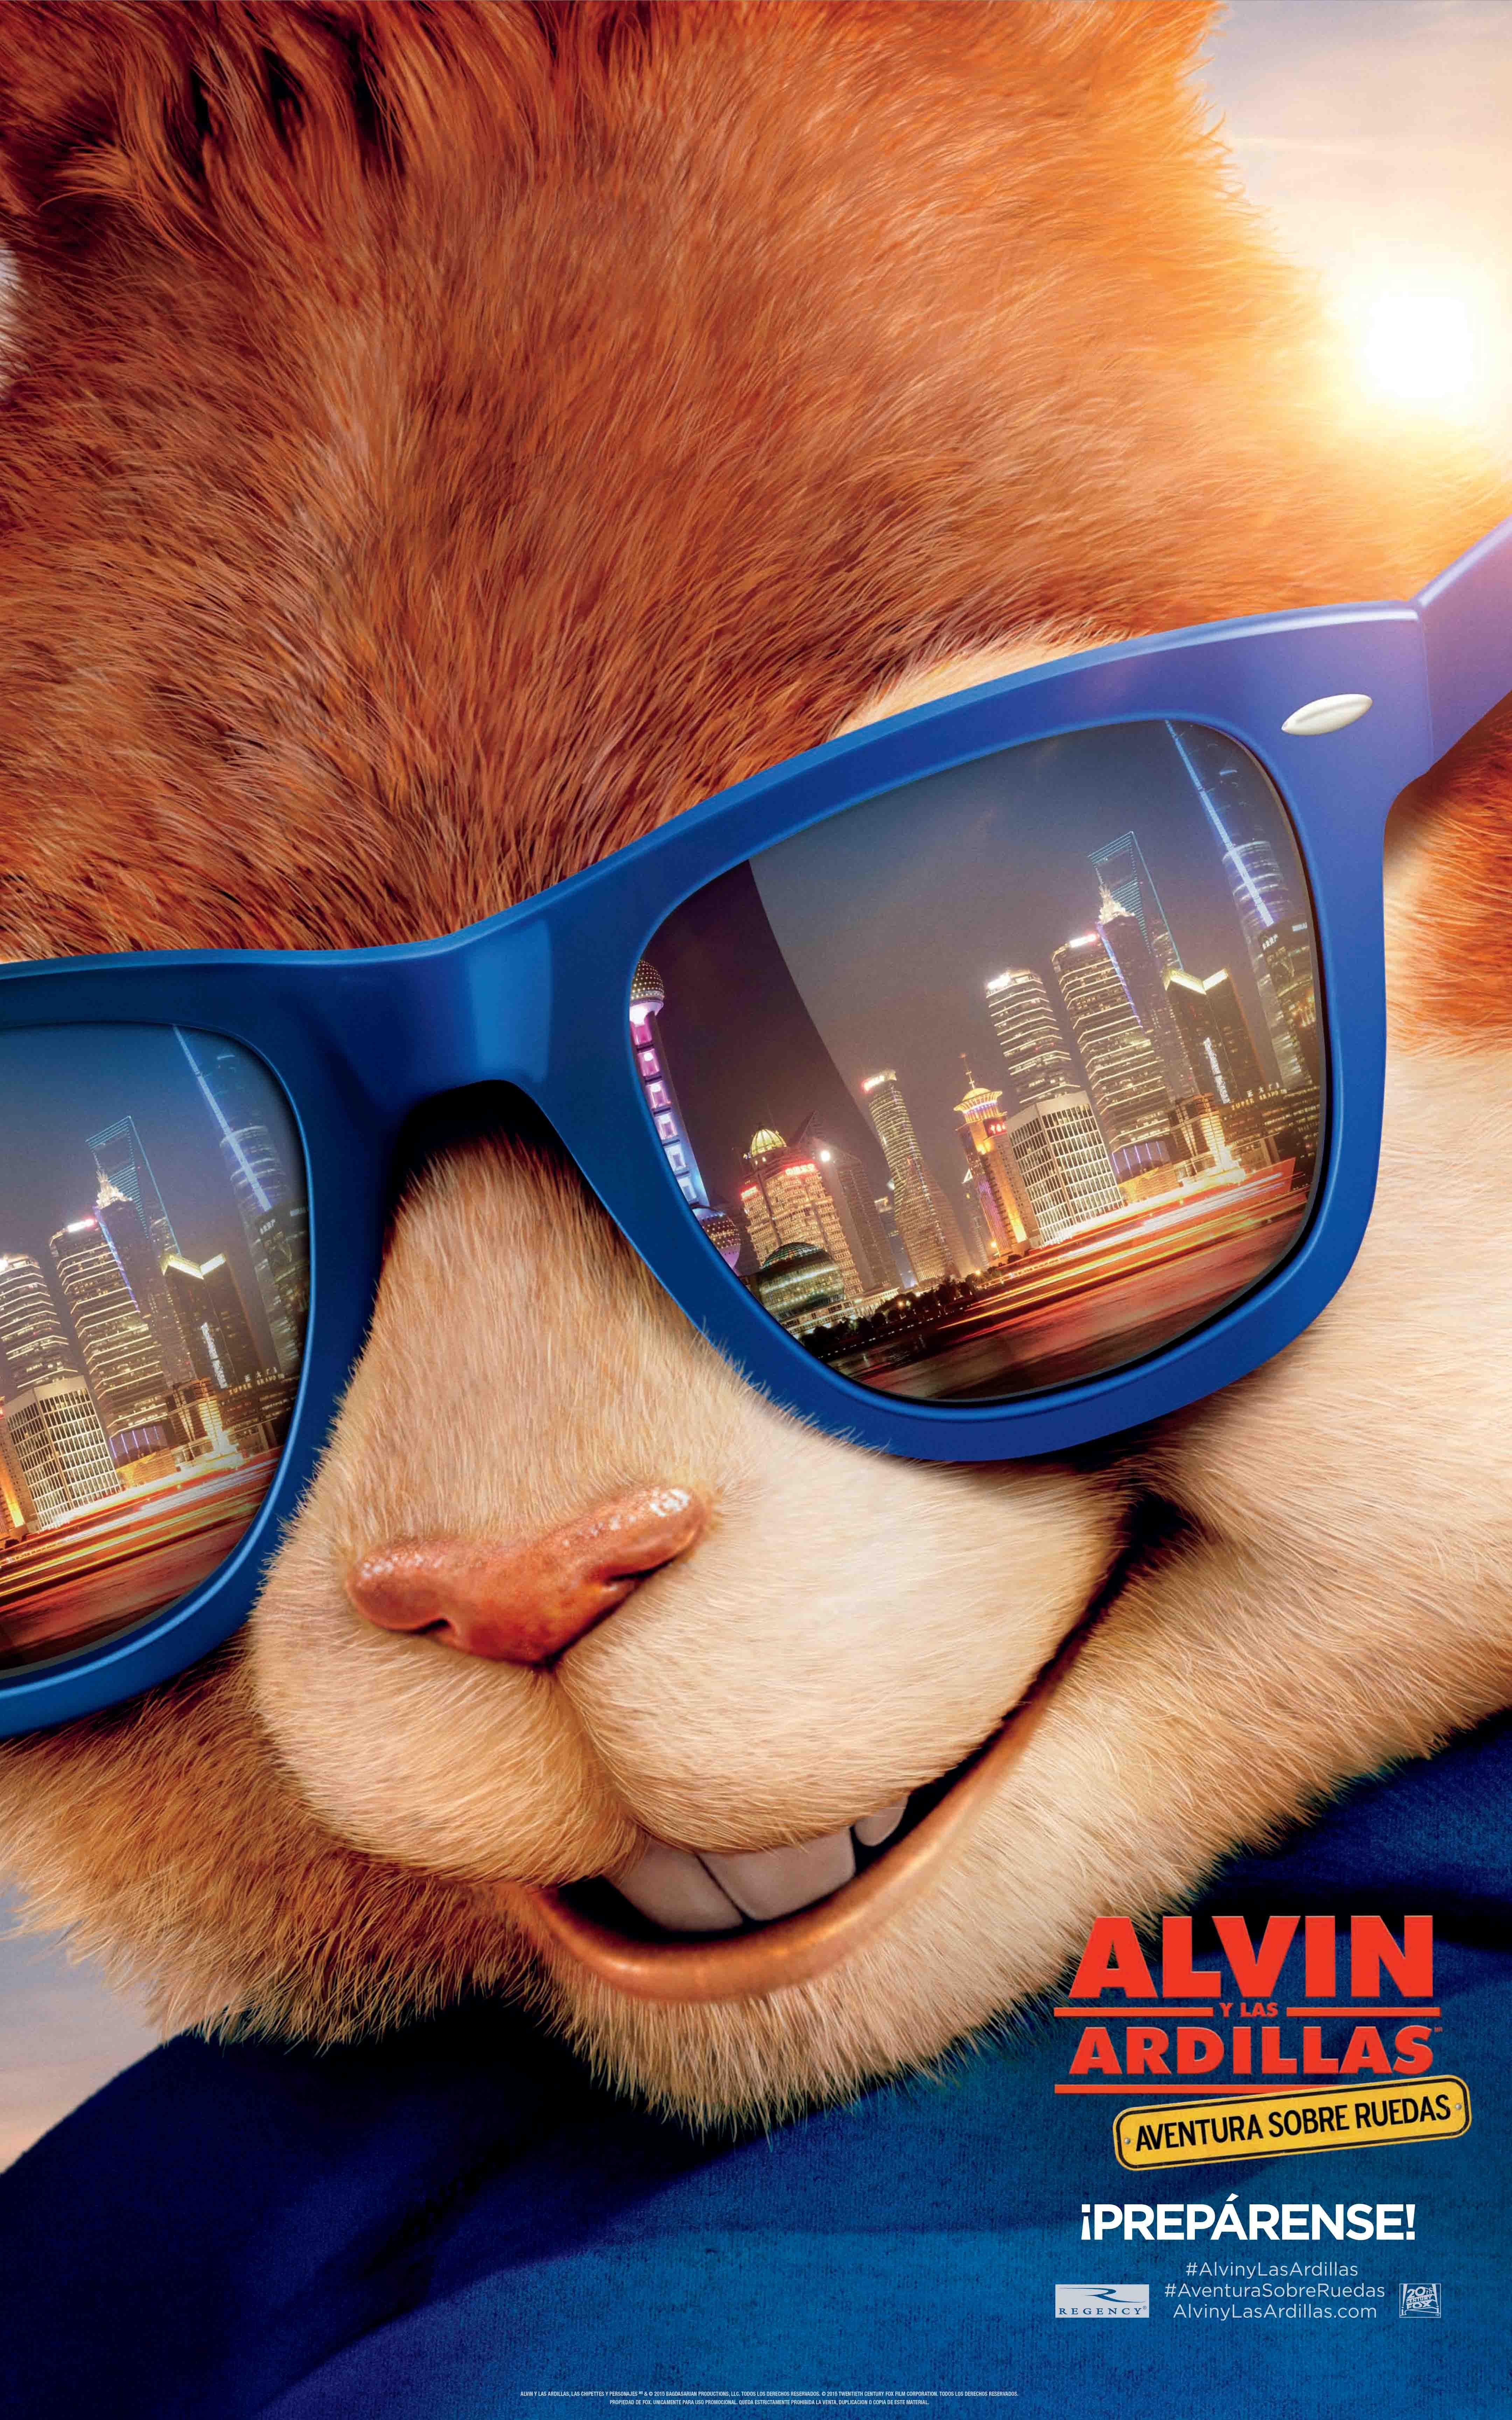 Pin By Royal Films On Alvin Y Las Ardillas Aventura Sobre Ruedas Alvin And Chipmunks Movie Chipmunks Movie Chipmunks